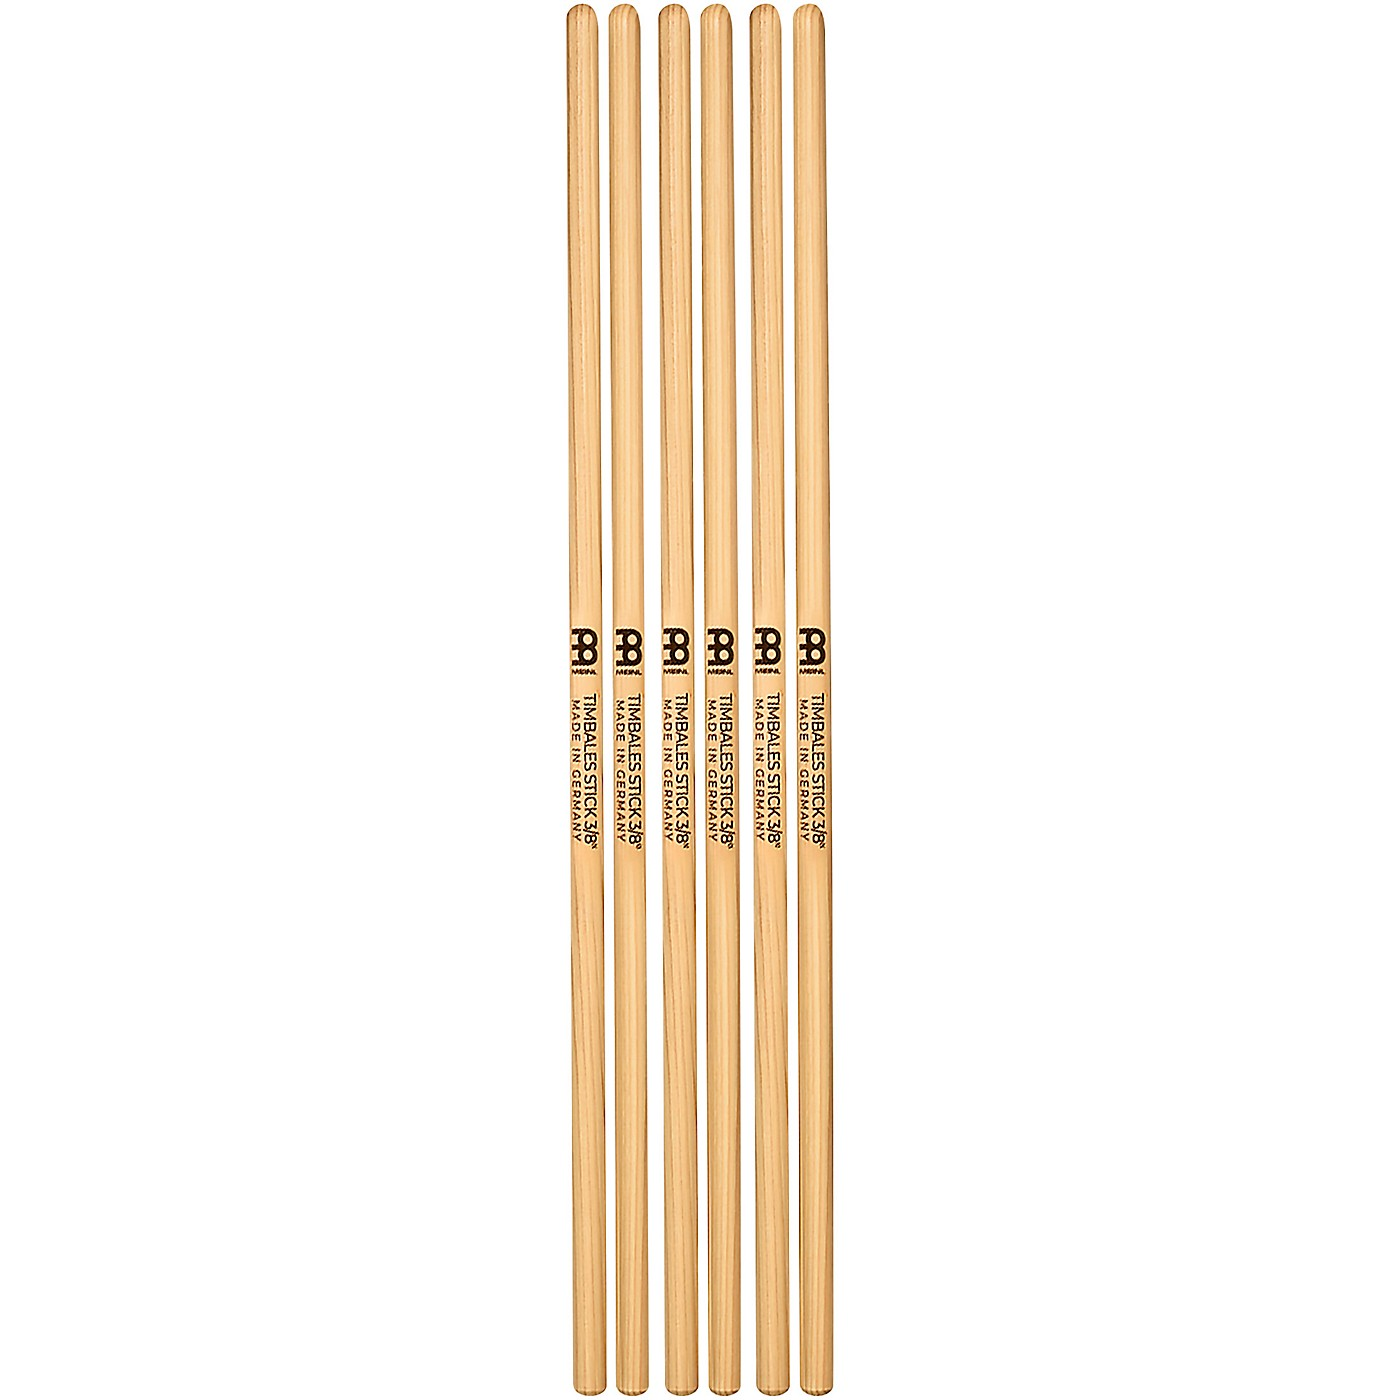 Meinl Stick & Brush Timbale Sticks 3-Pack thumbnail